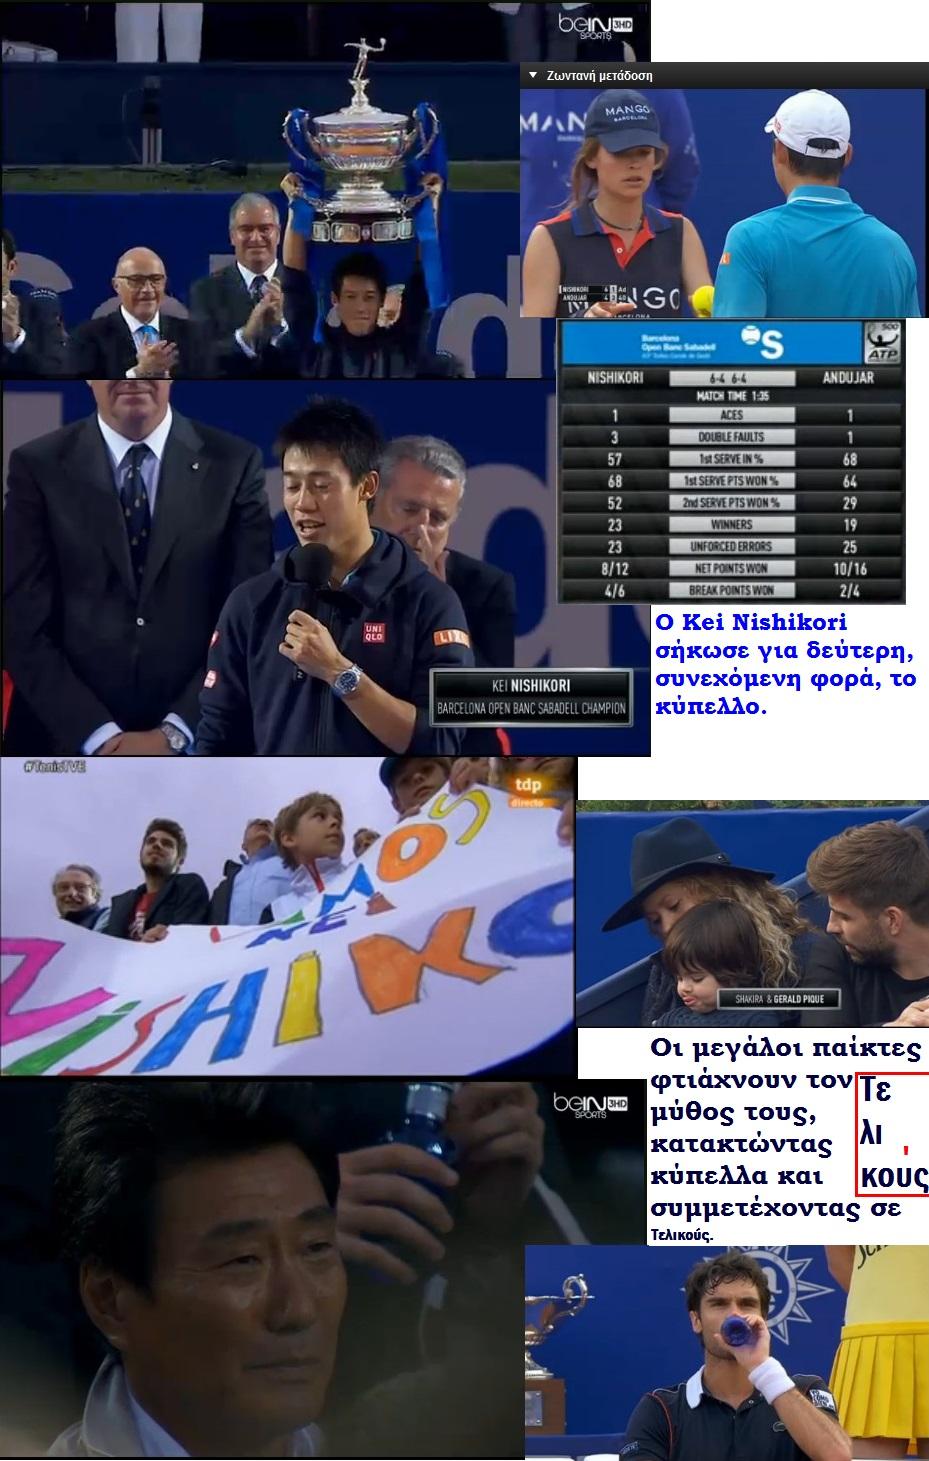 TENNIS ATP BARCELONA NISHIKORI WIN VS ANDUJAR 01 270415